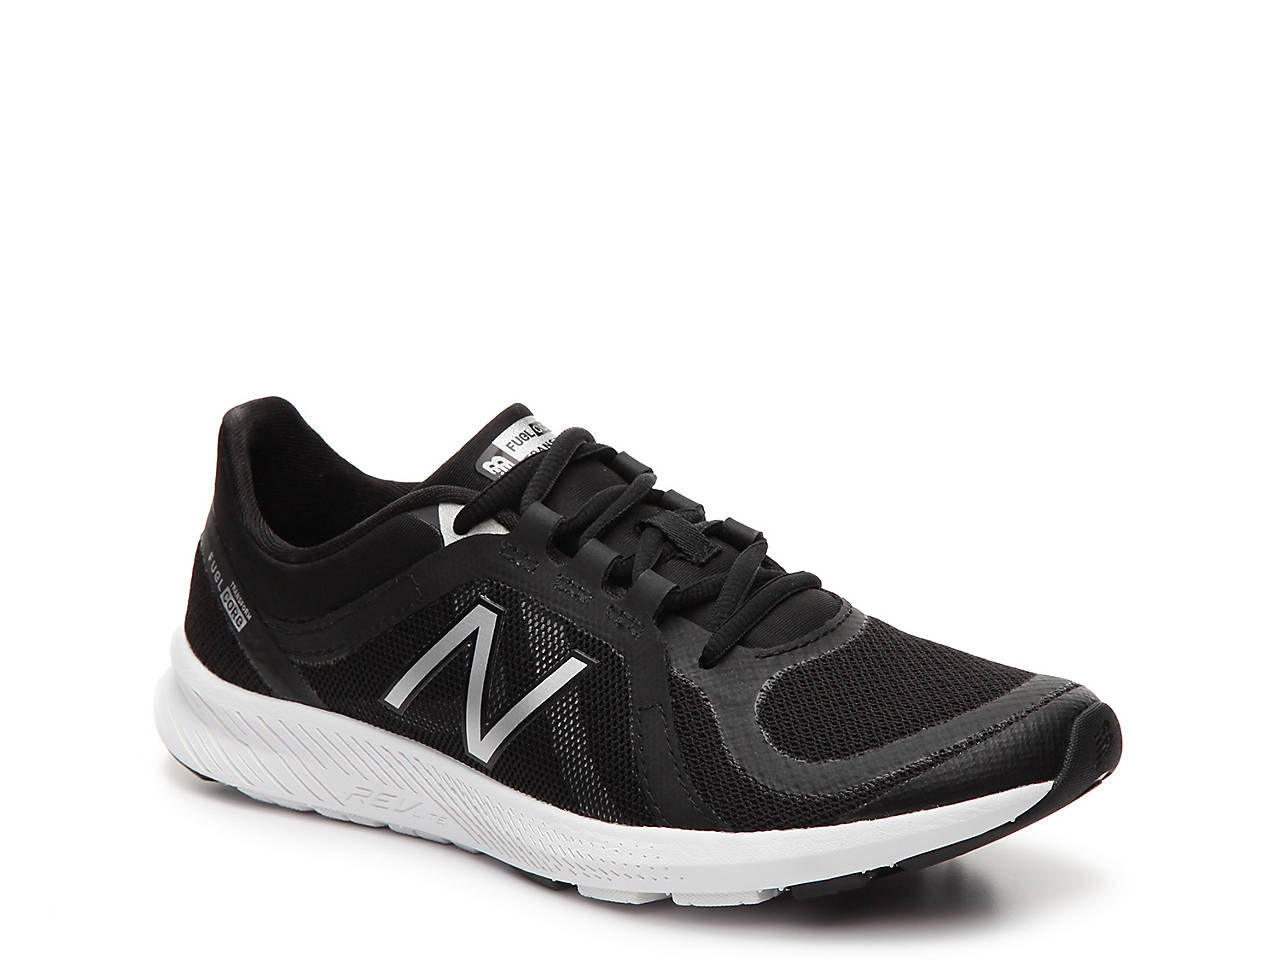 eed9a5823949 New Balance FuelCore Transform V2 Training Shoe - Women s Women s ...